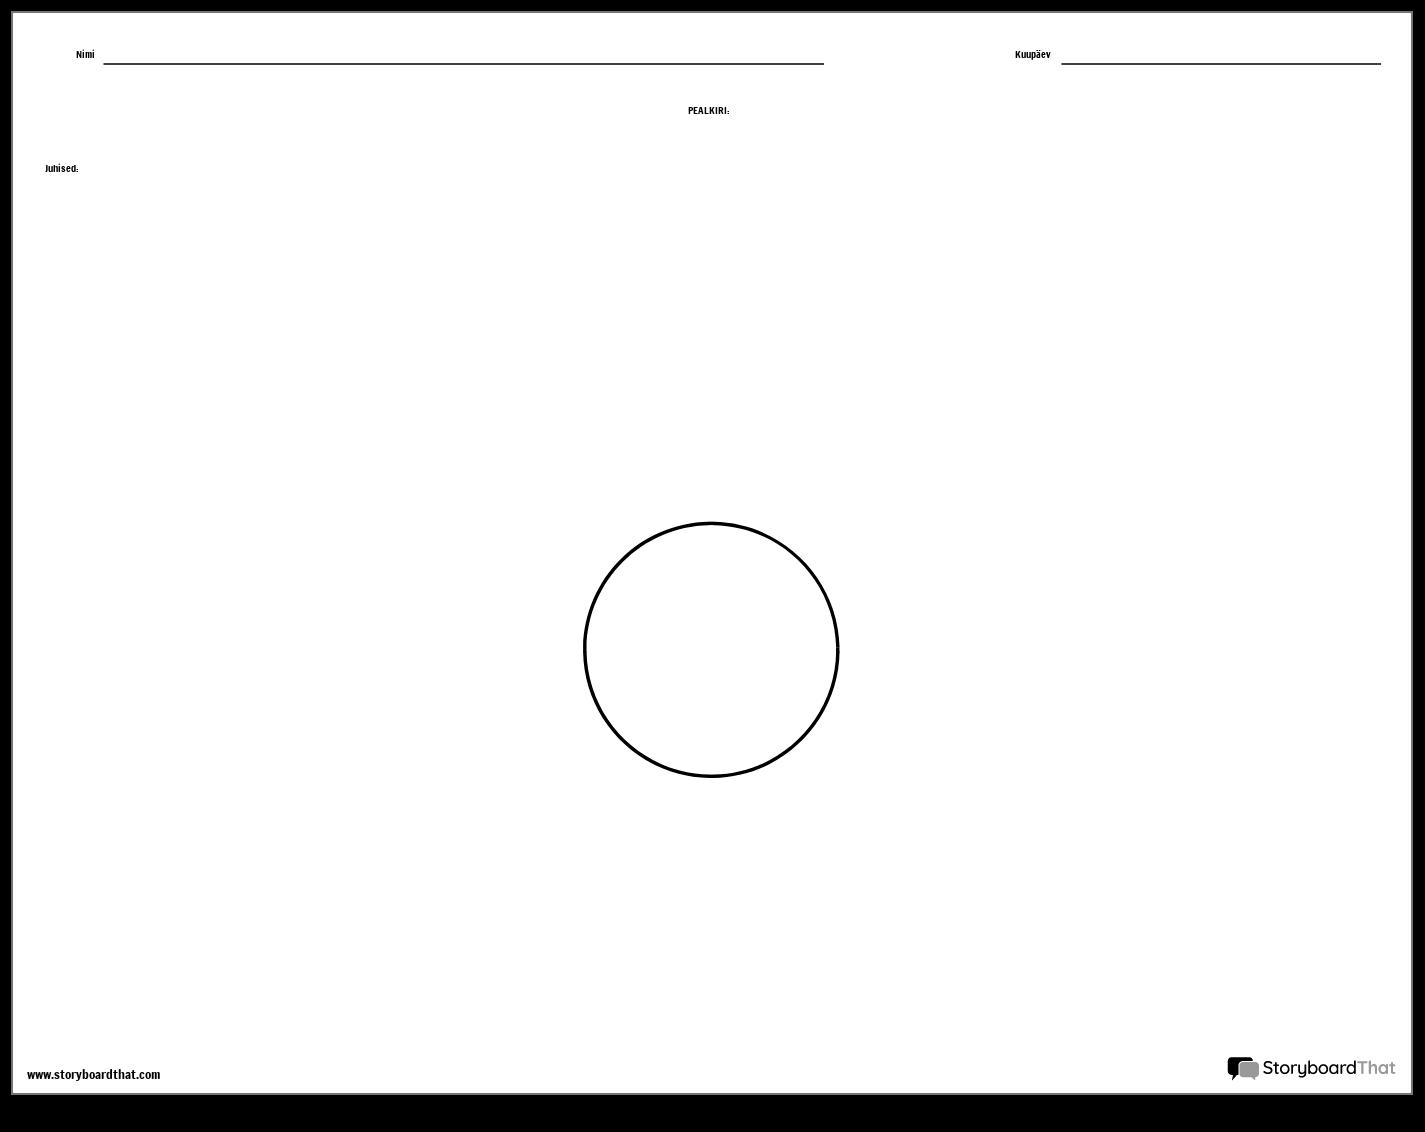 Ringikujuline Diagramm - 9